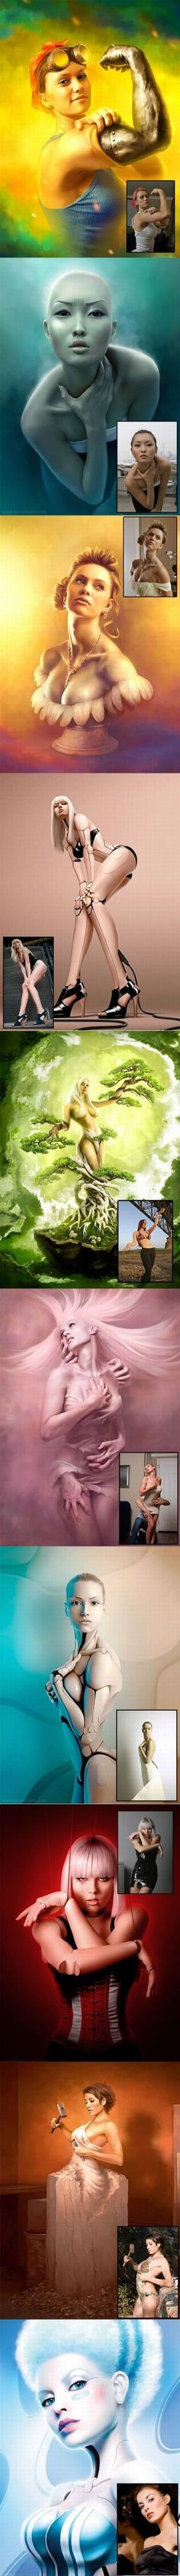 Great digital painting from photos. Who is the Artist? art,art drawings,art deco,artichoke recipes,art studio